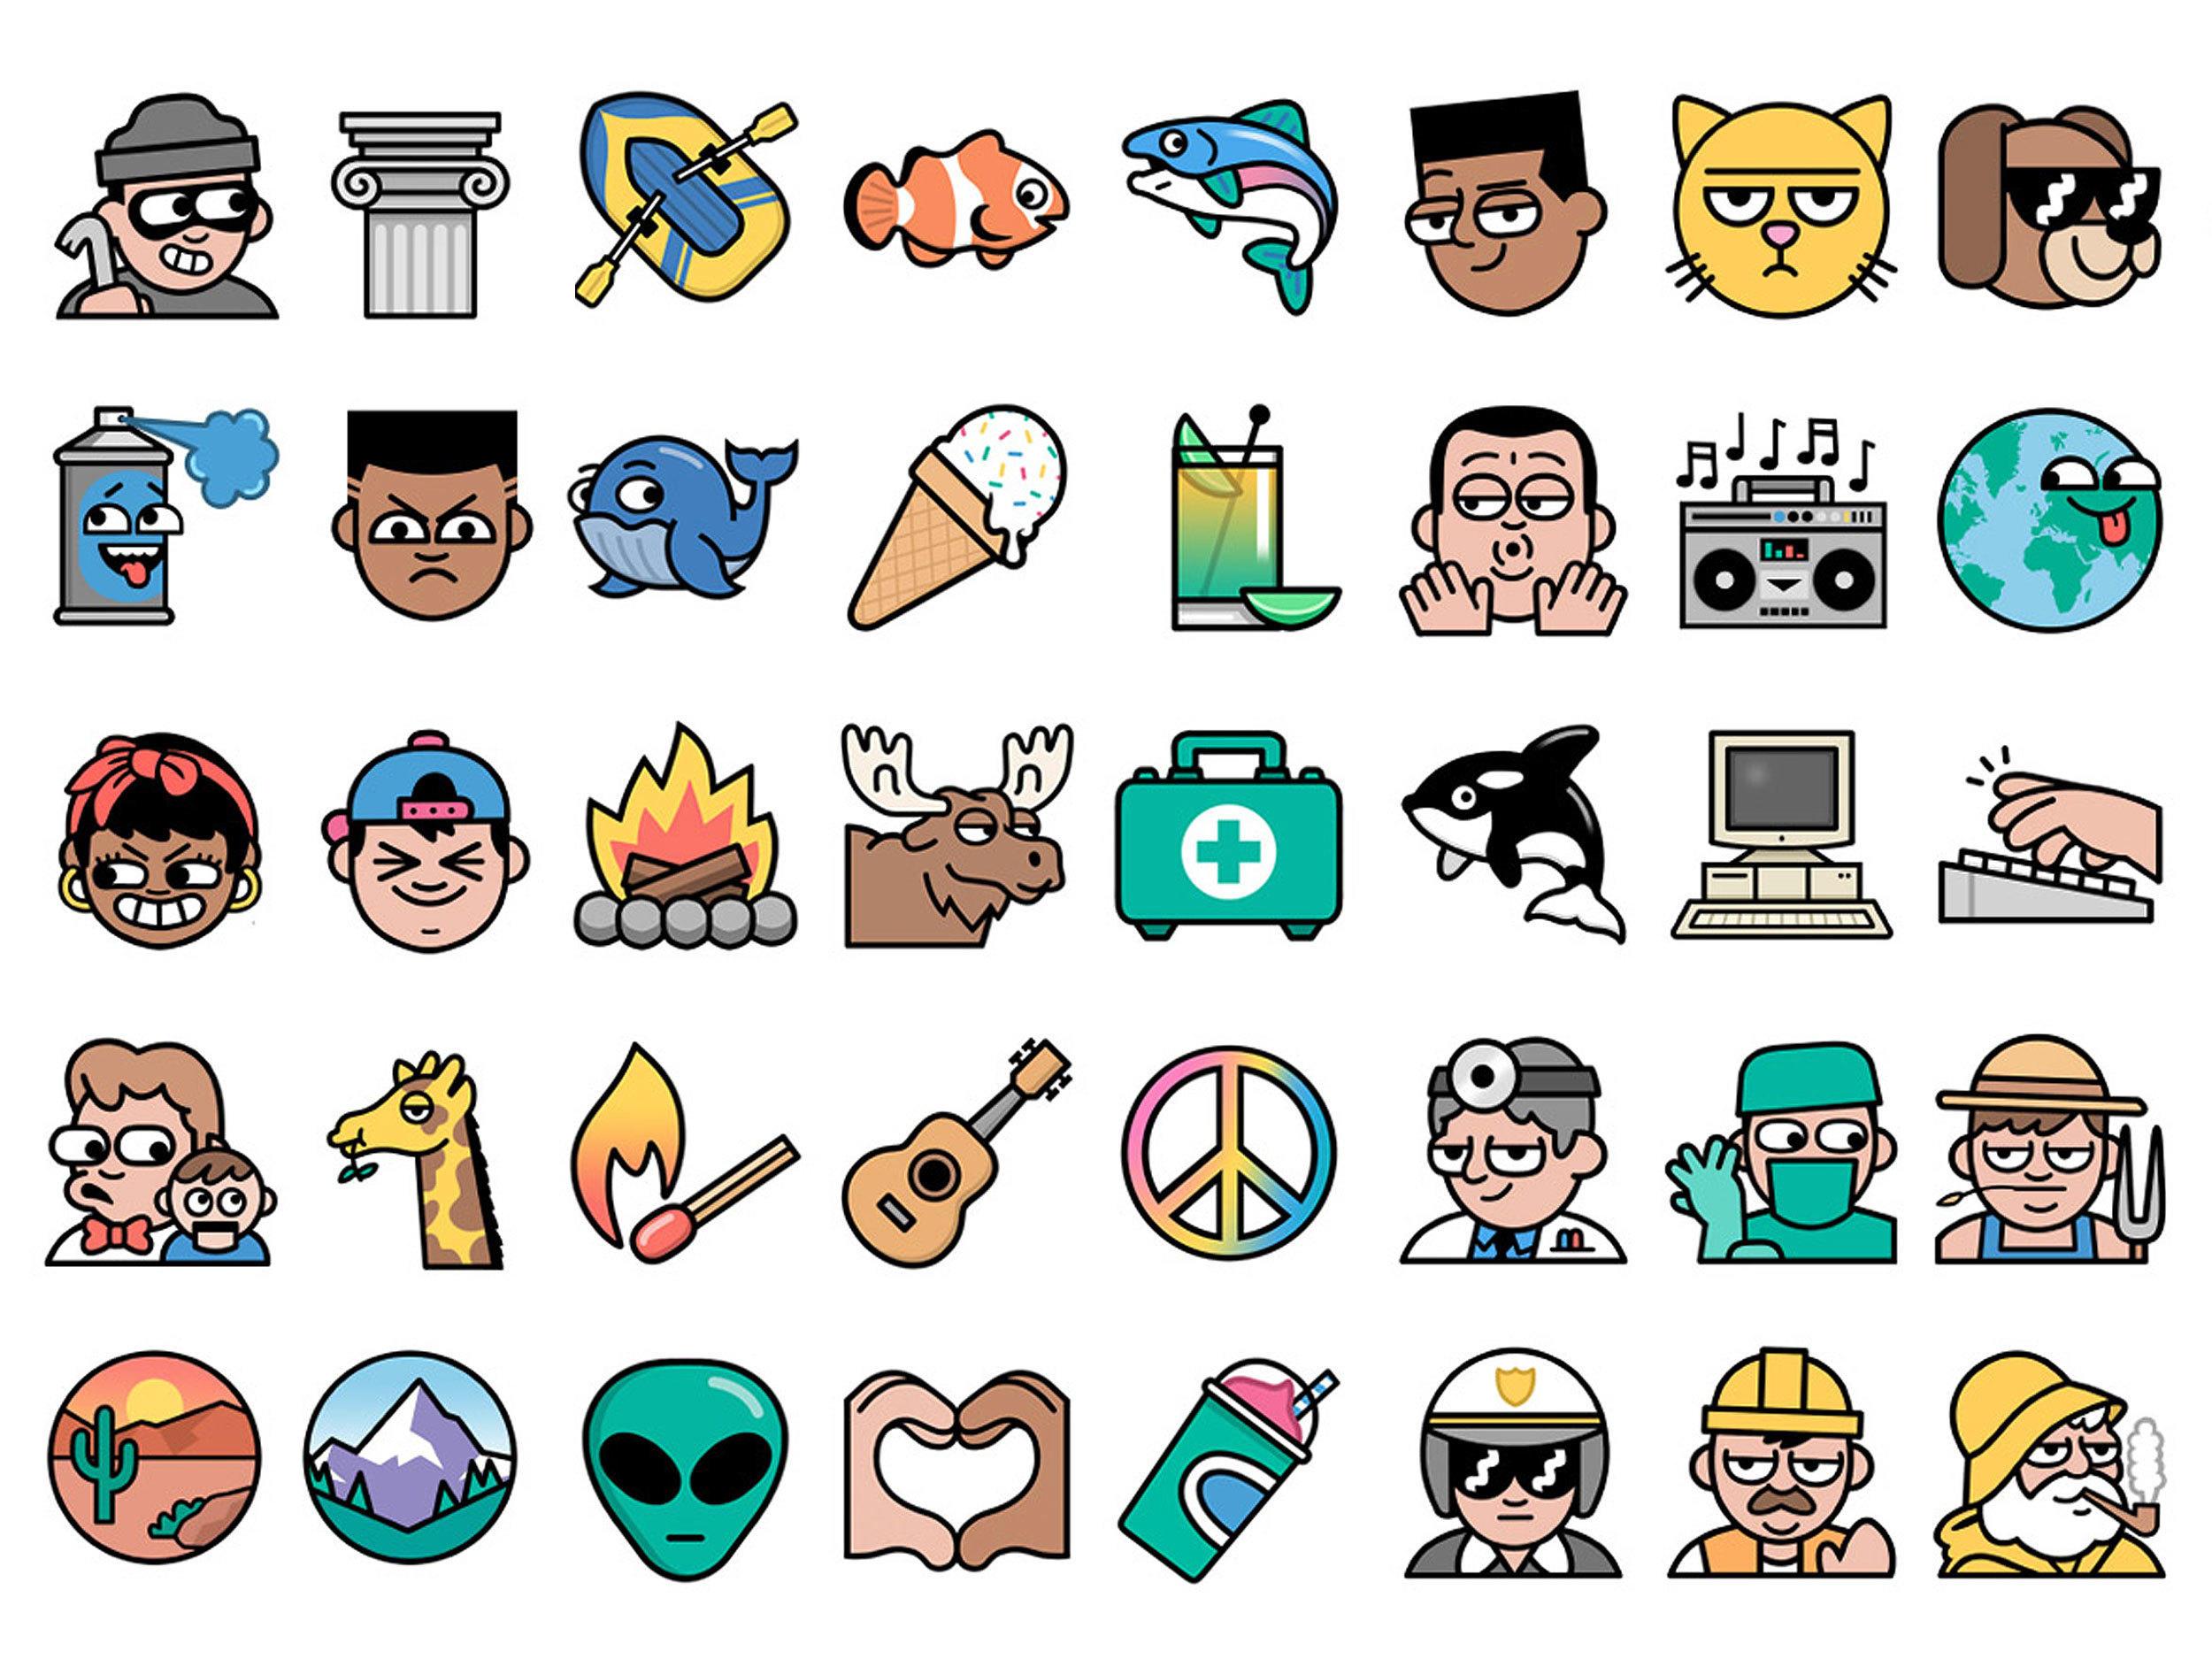 Single Line Emoji Art : Line emoji project — dan woodger illustration